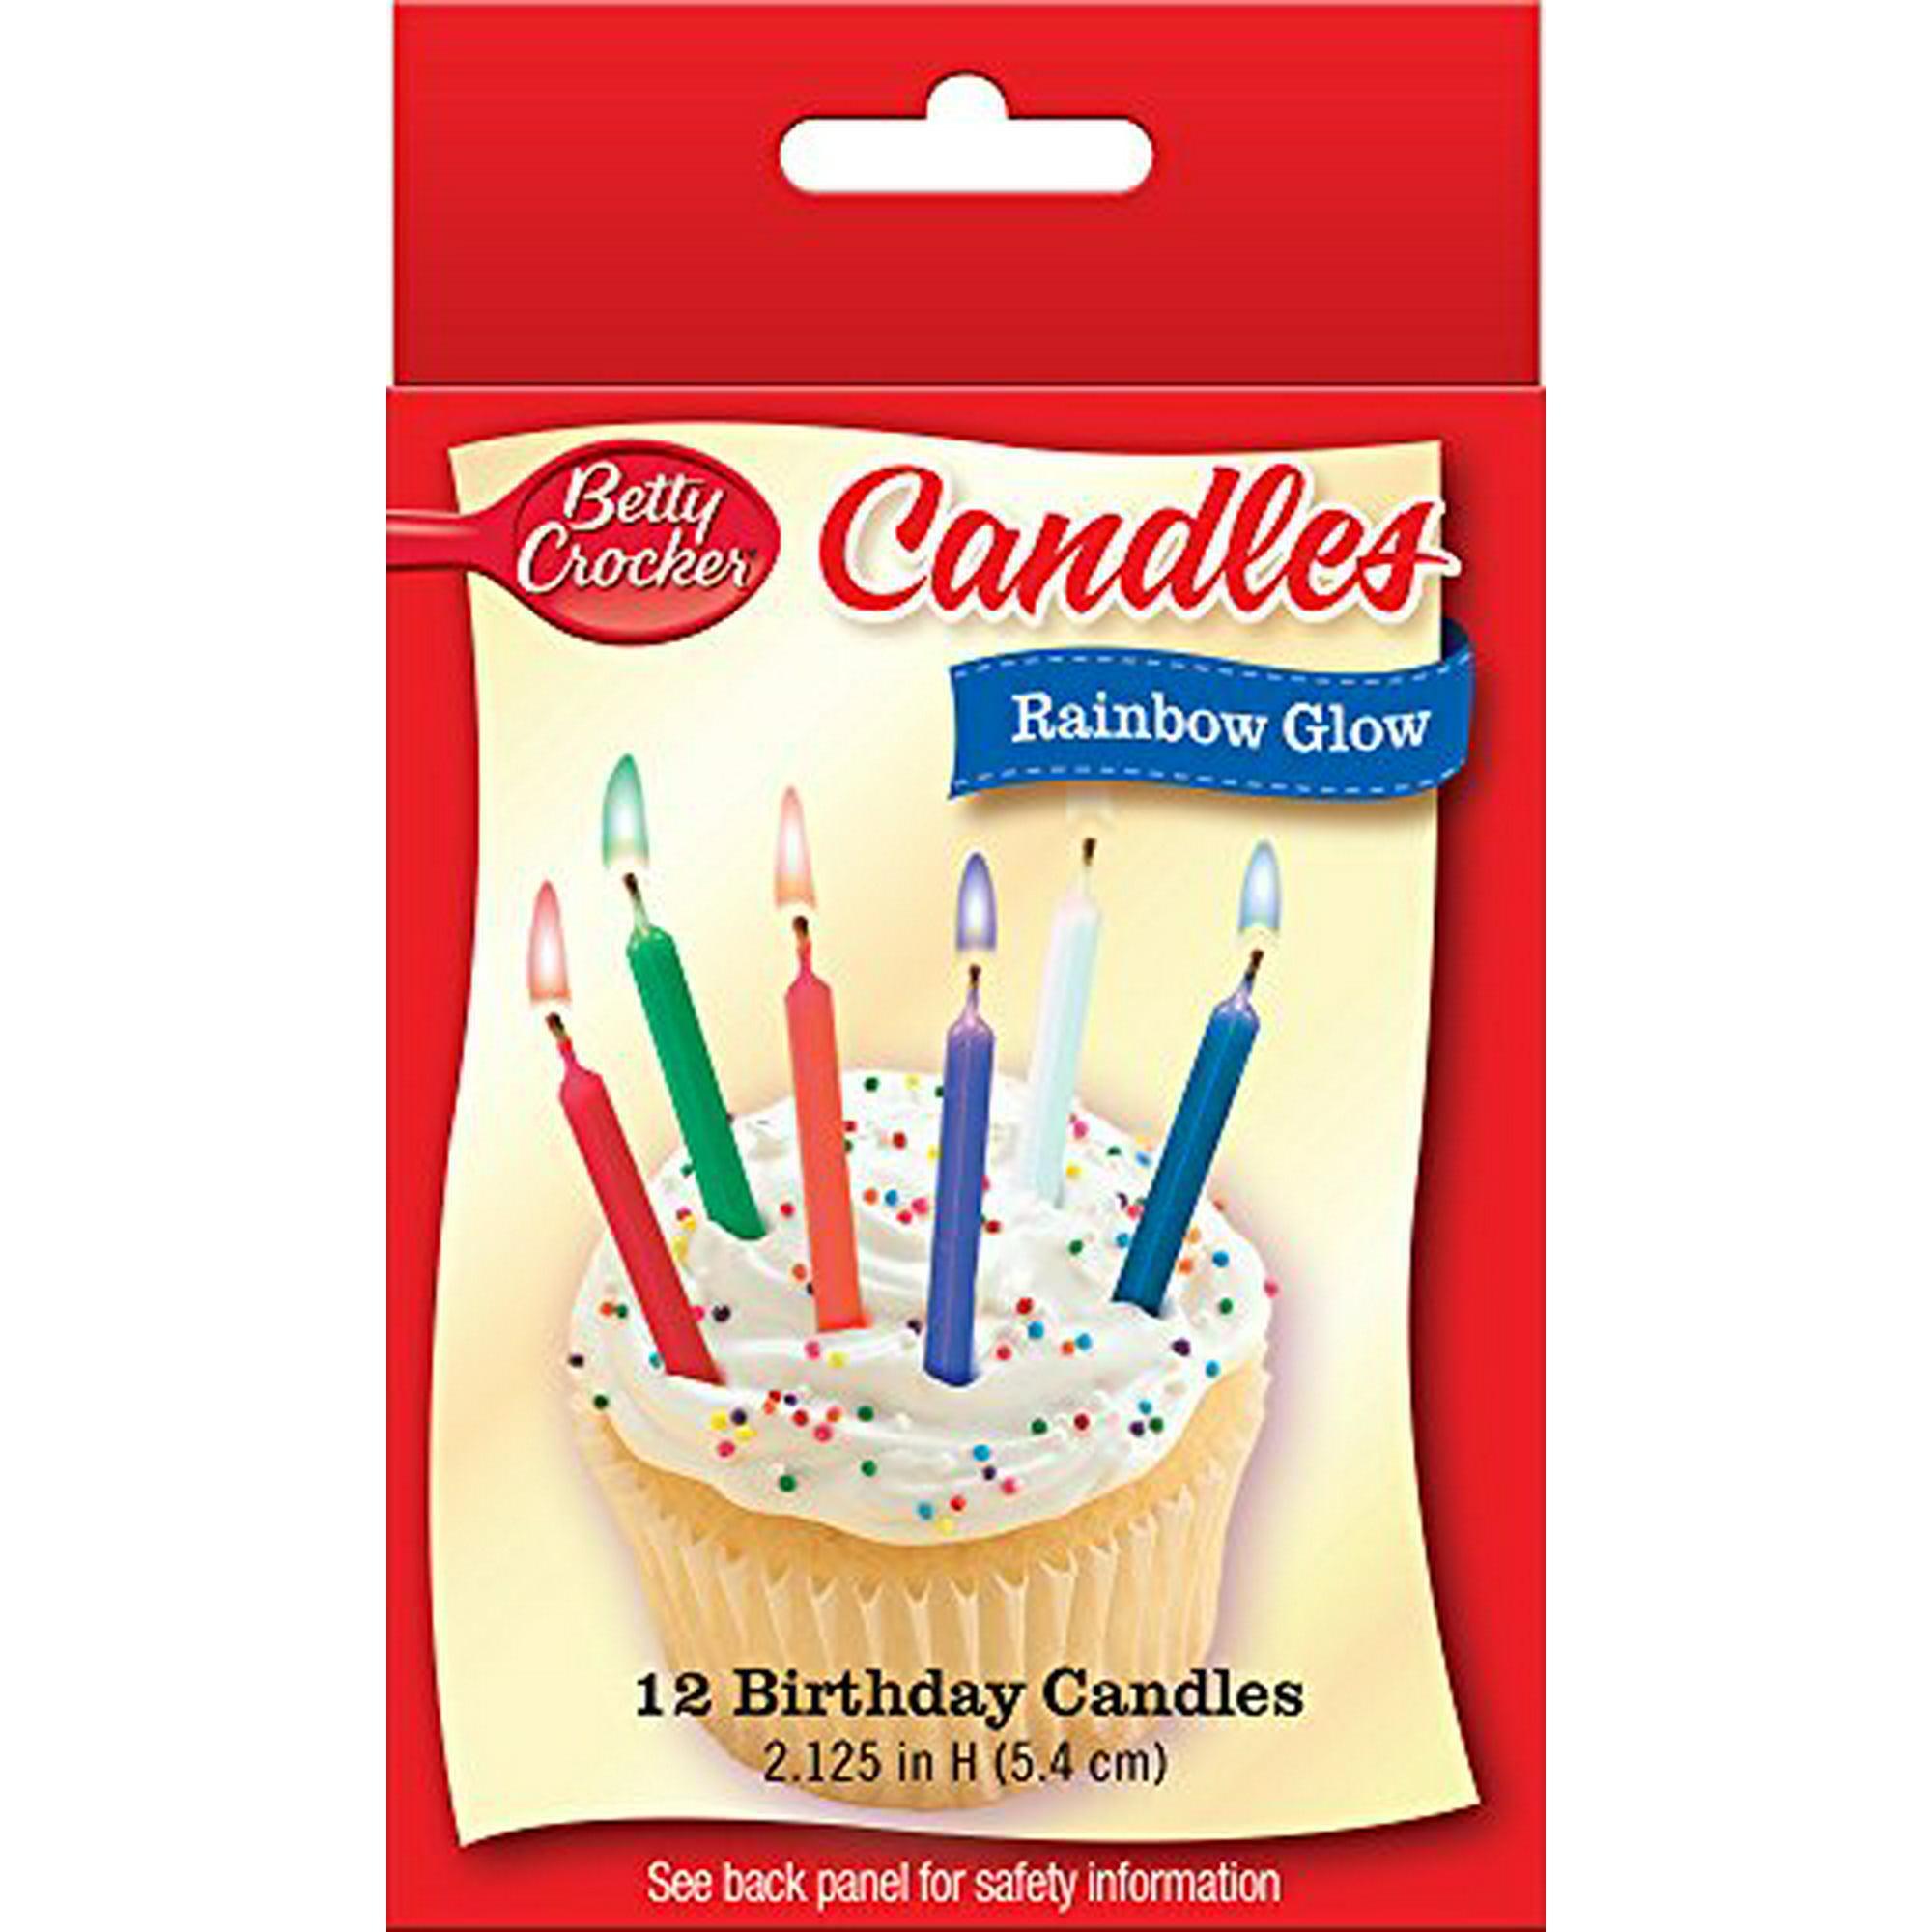 Fabulous Betty Crocker Rainbow Glow Birthday Candles Walmart Canada Birthday Cards Printable Inklcafe Filternl